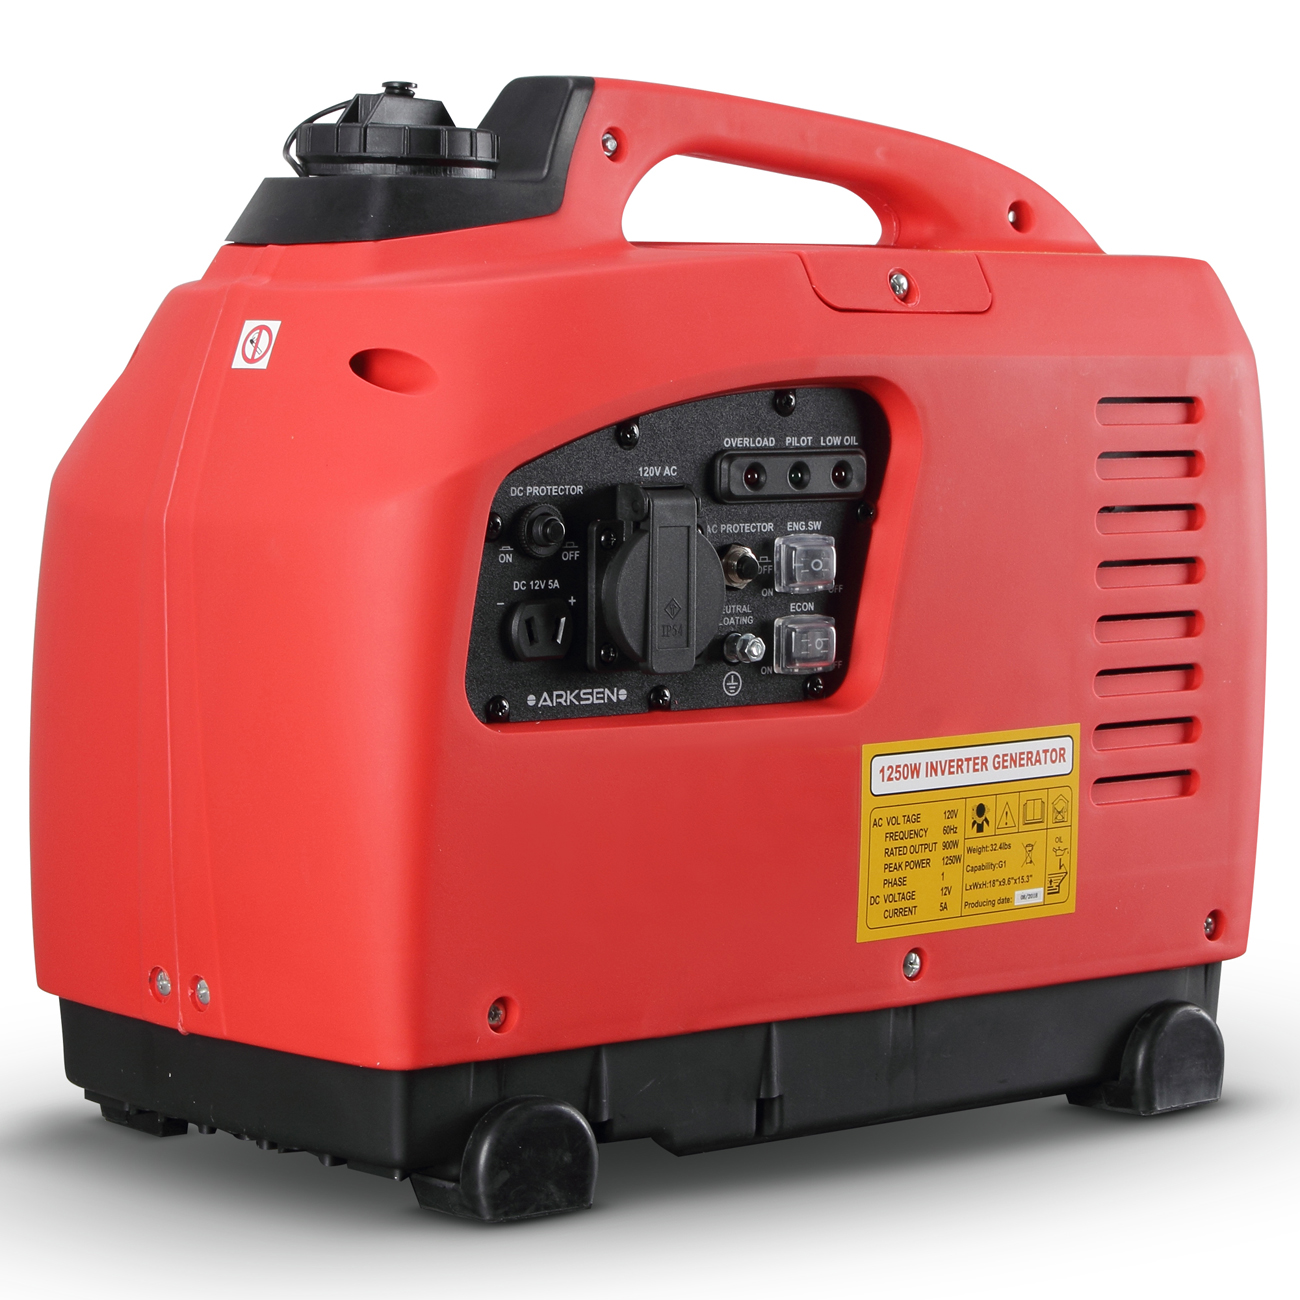 ARKSEN Portable Gas-Powered Quiet Inverter Generator Peak 1250-Watt Gasoline EPA (CARB) Compliant